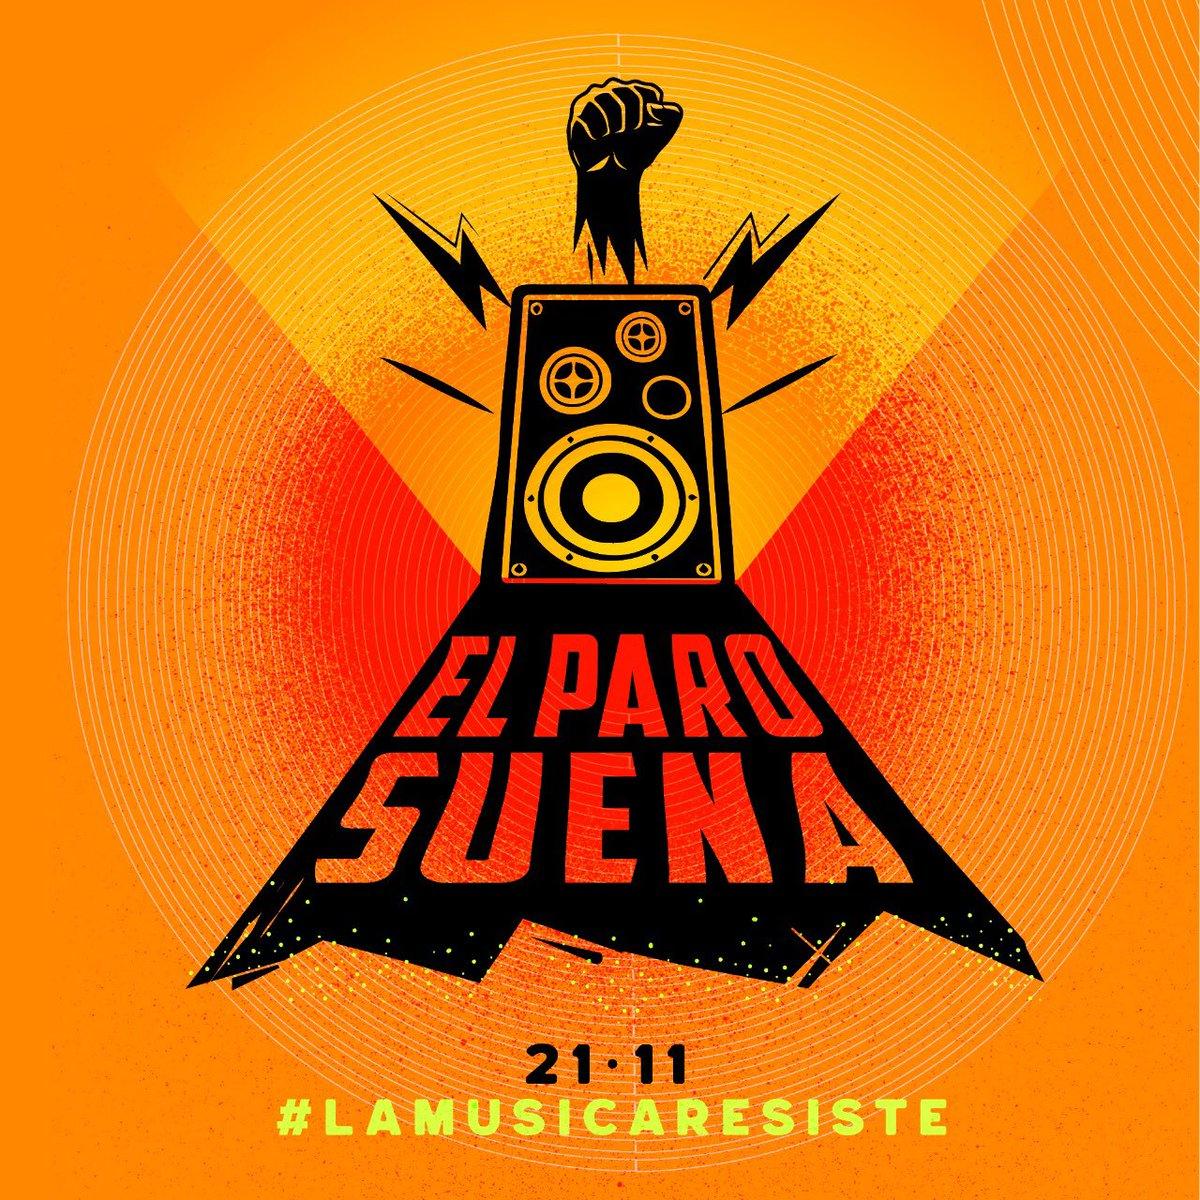 Nos une hacernos escuchar. #NosUneLaMúsica  #21N #ElParoSuena #LaMúsicaResistepic.twitter.com/7QSC0yFLSj